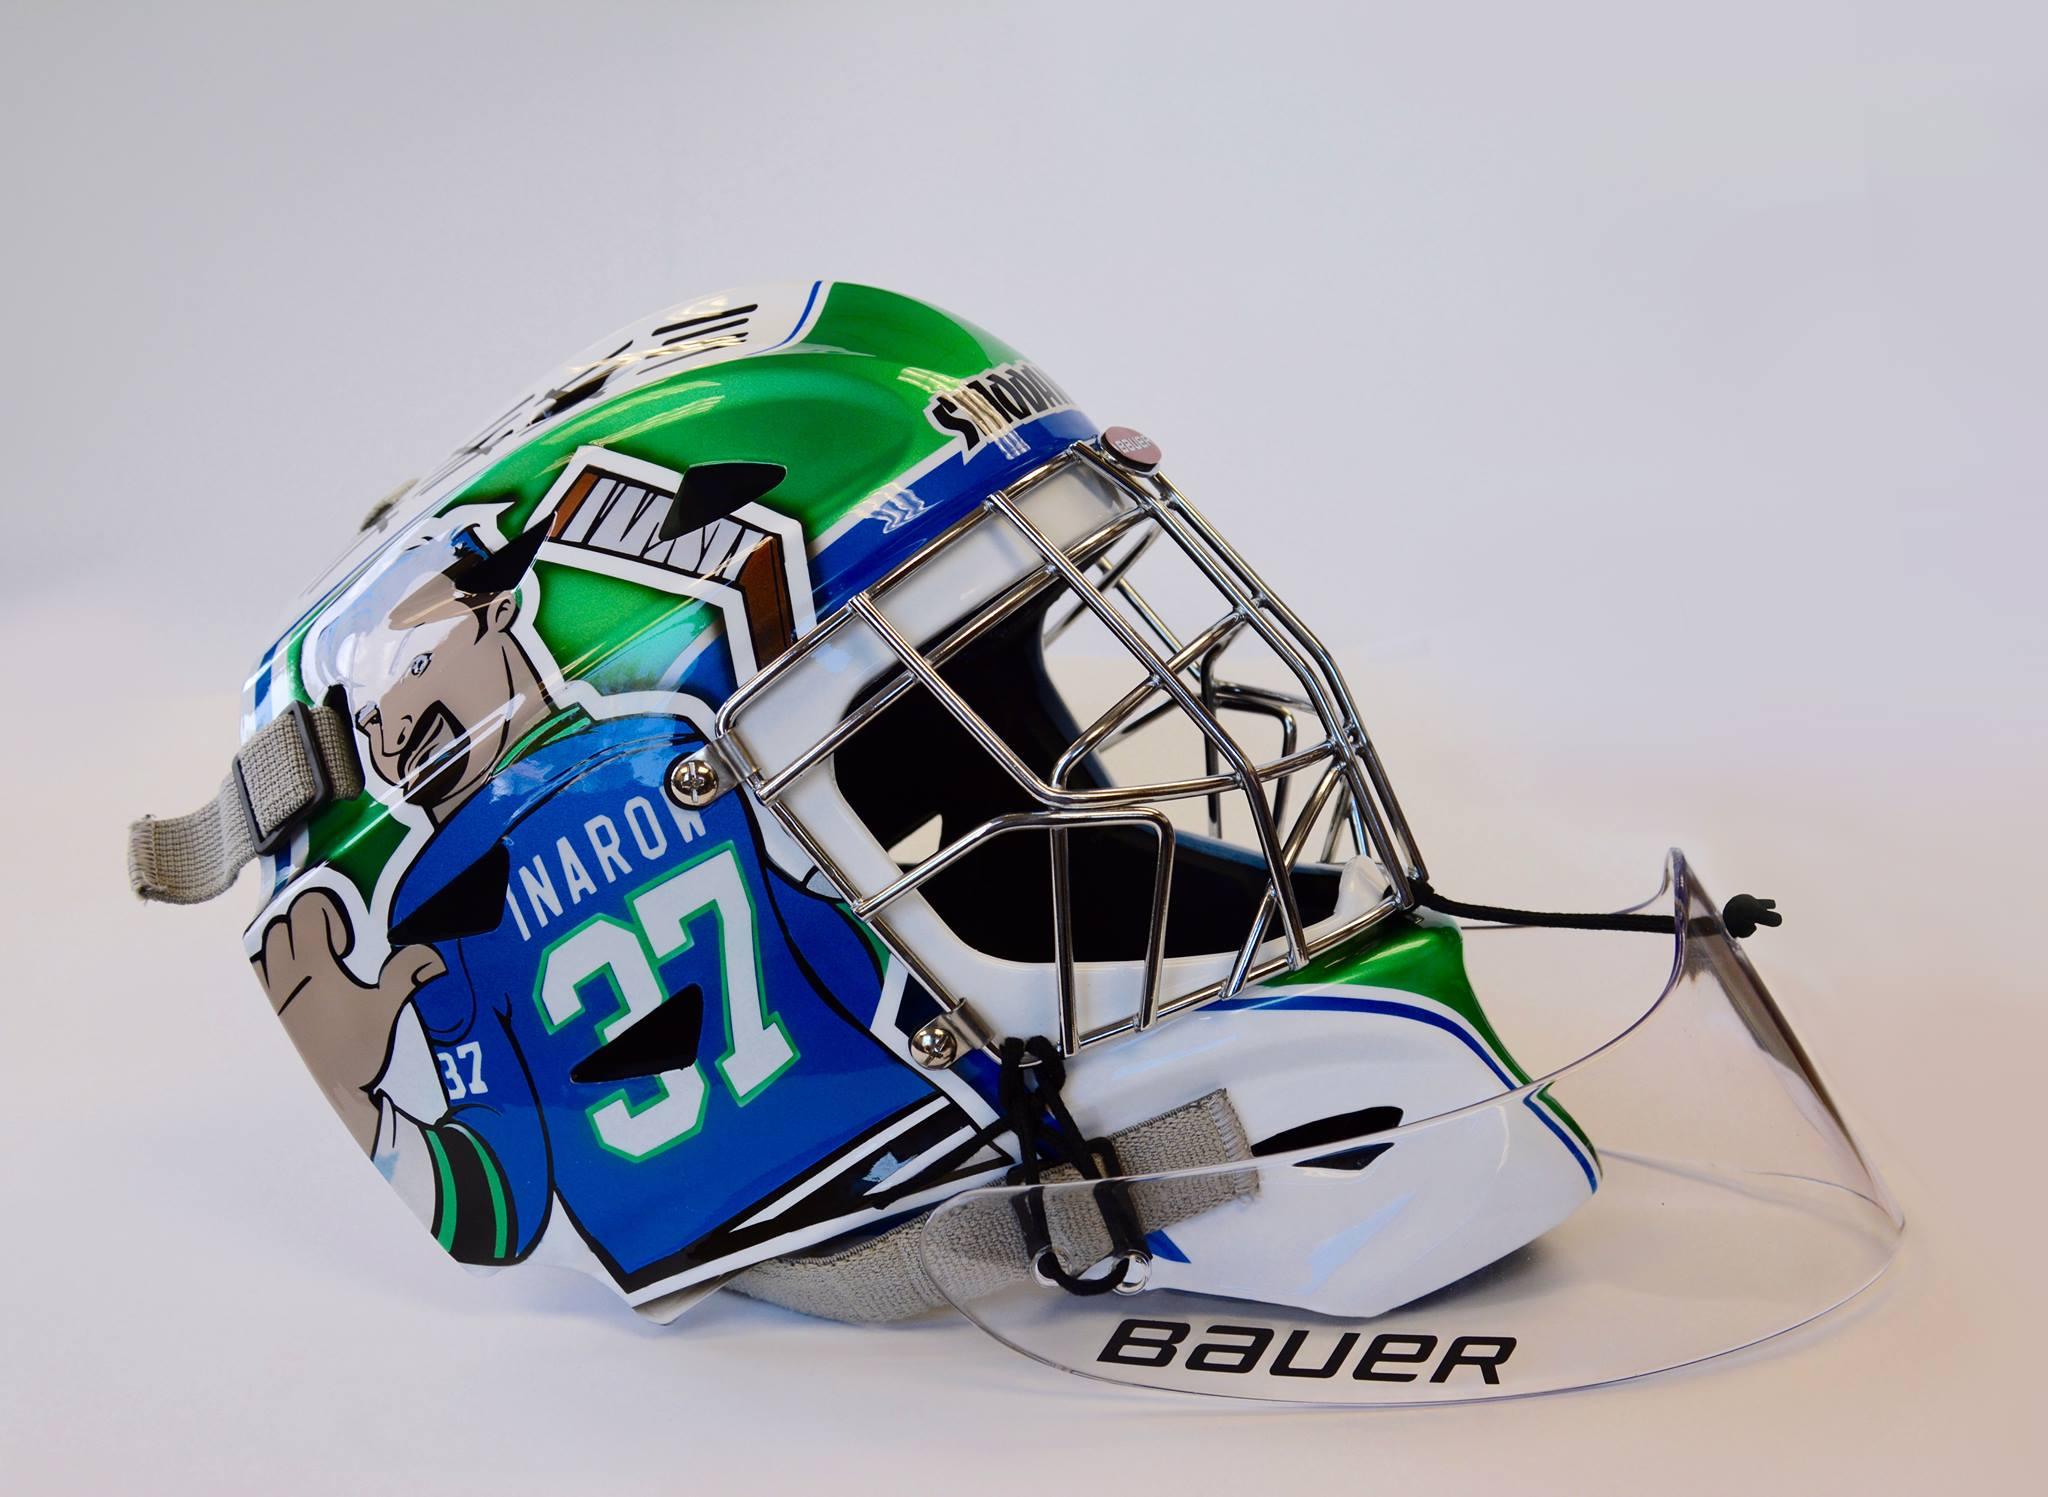 37's Goalie Mask in 2016